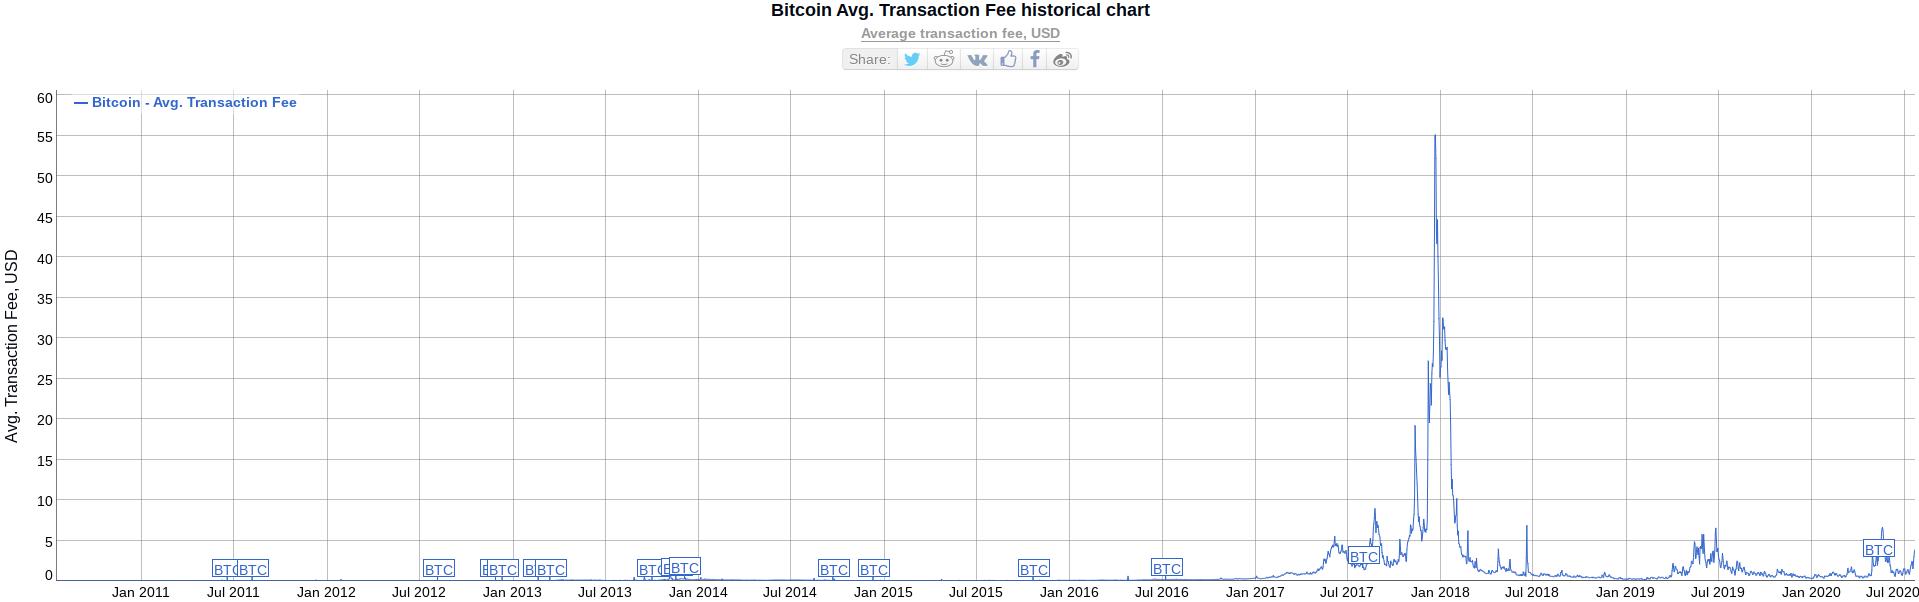 Bitcoin fees chart